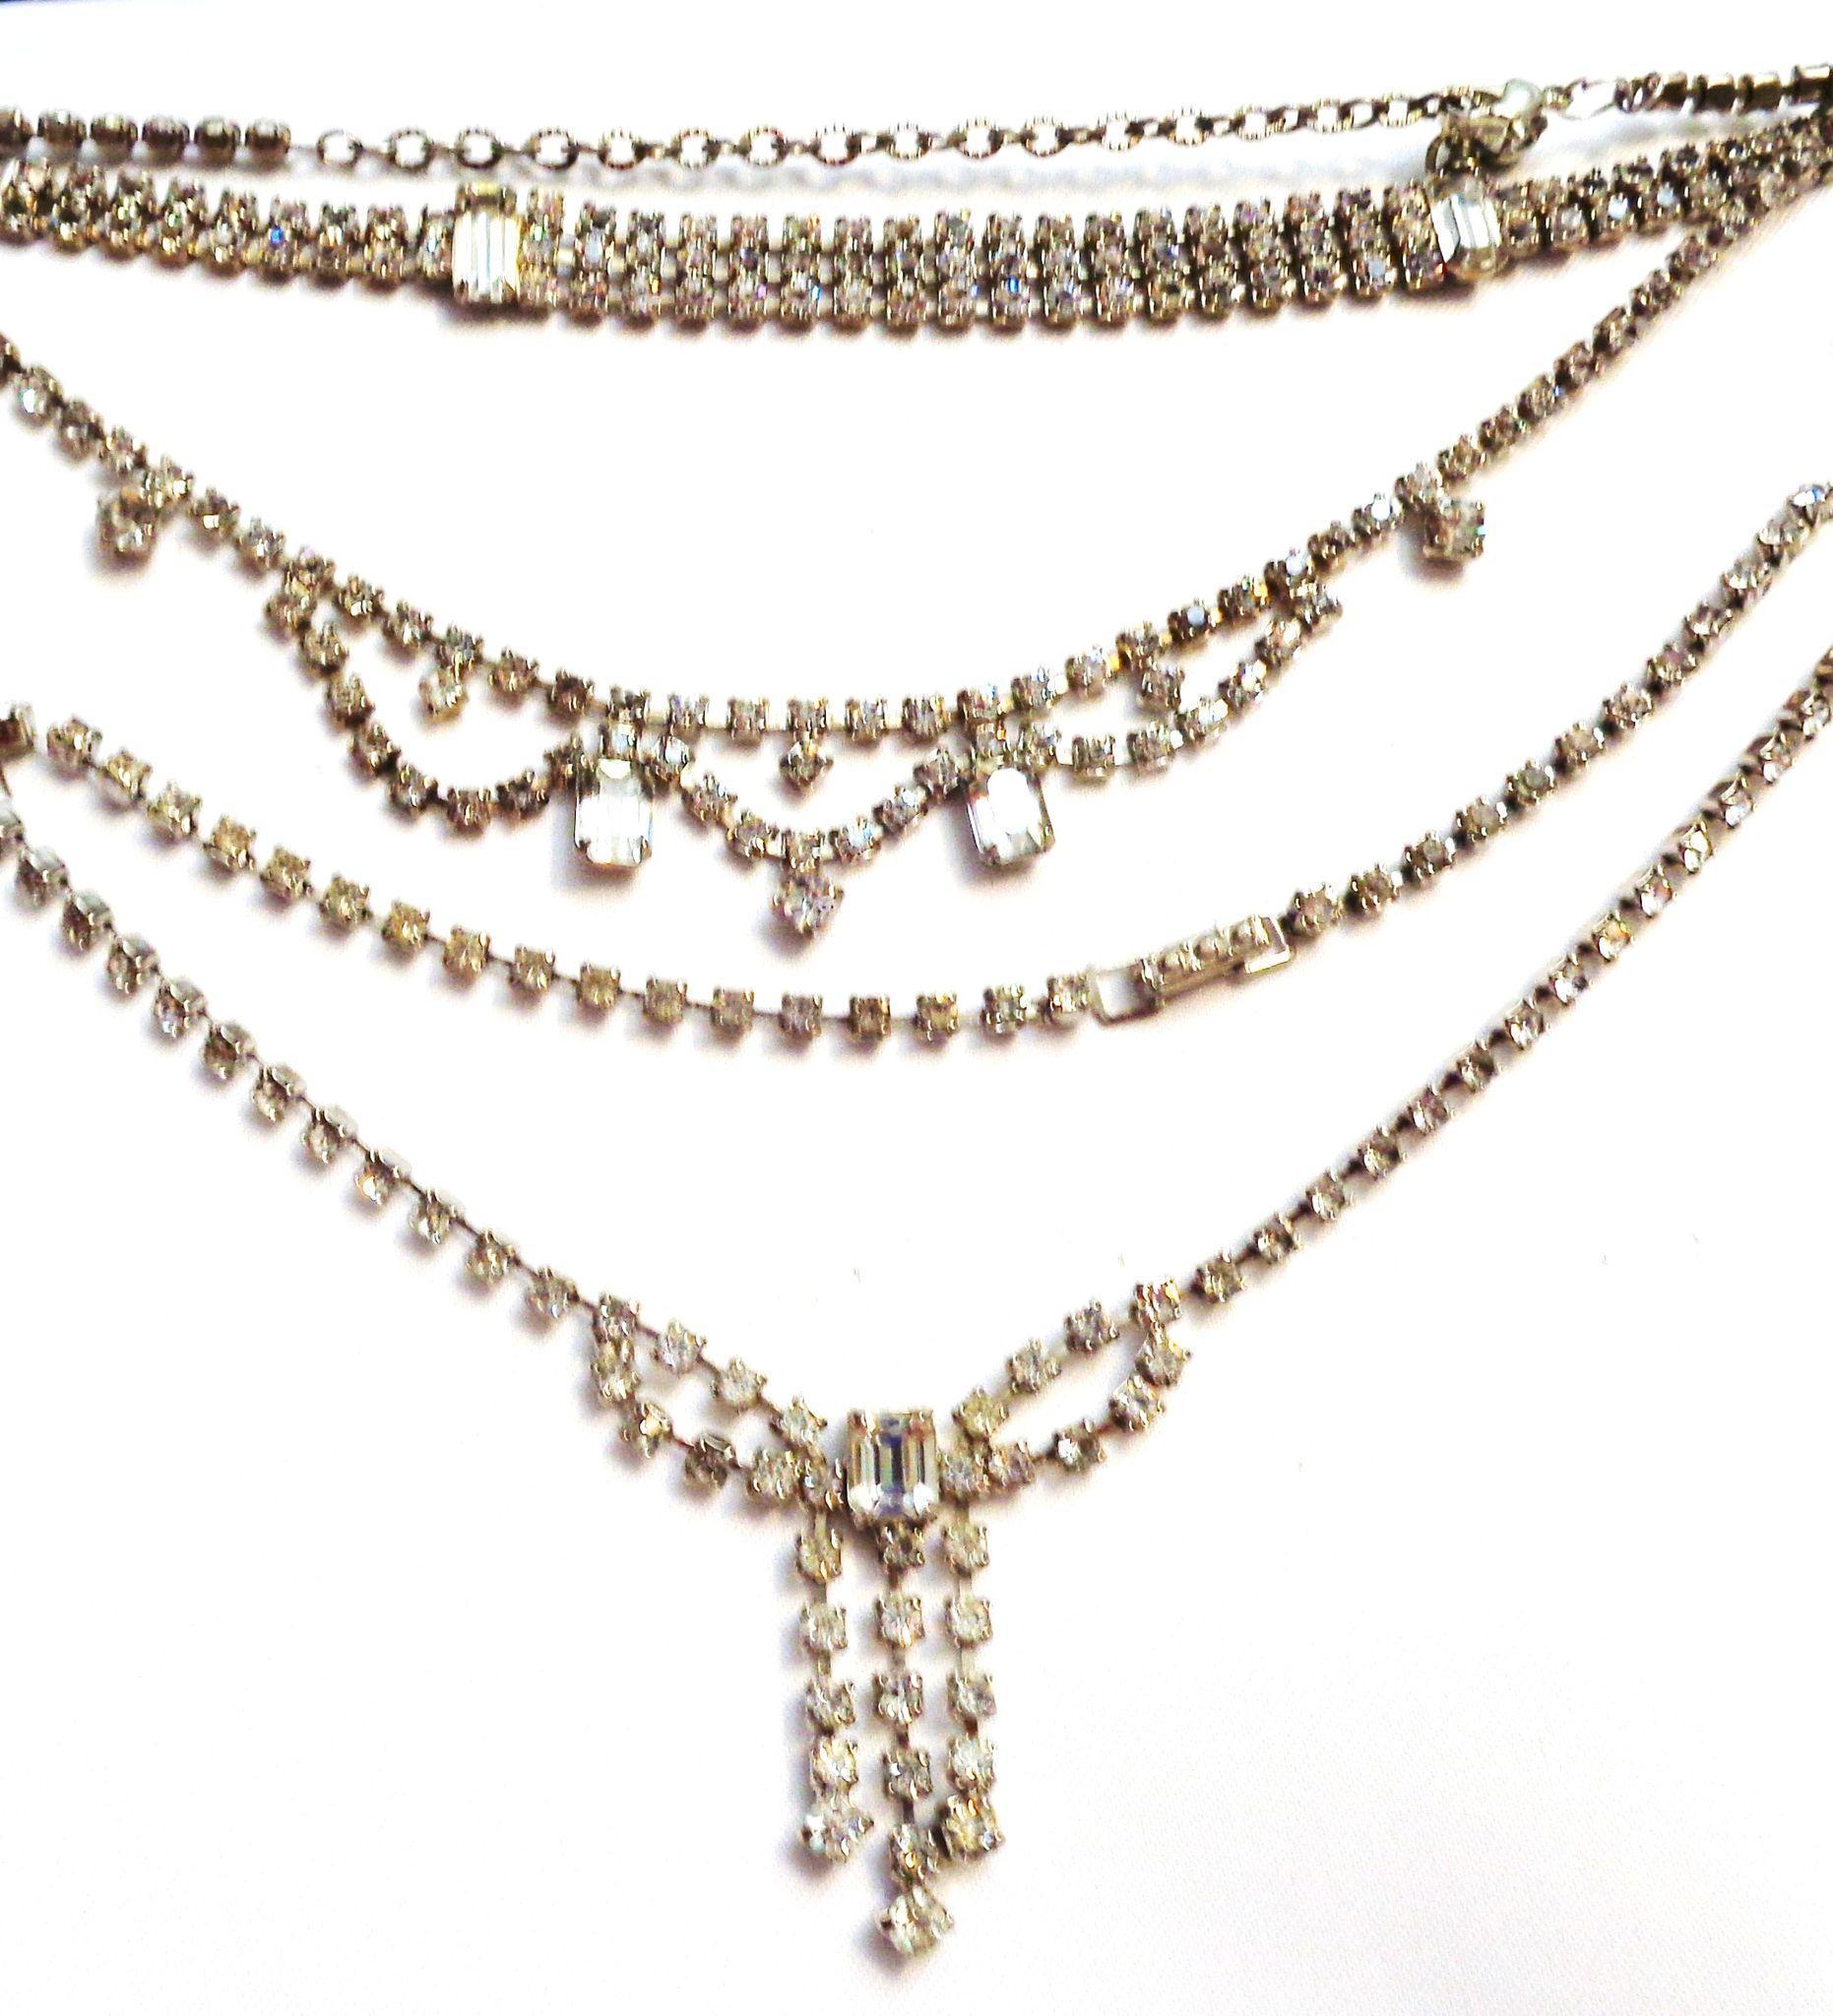 2 vintage rhinestone necklaces matching bracelet from